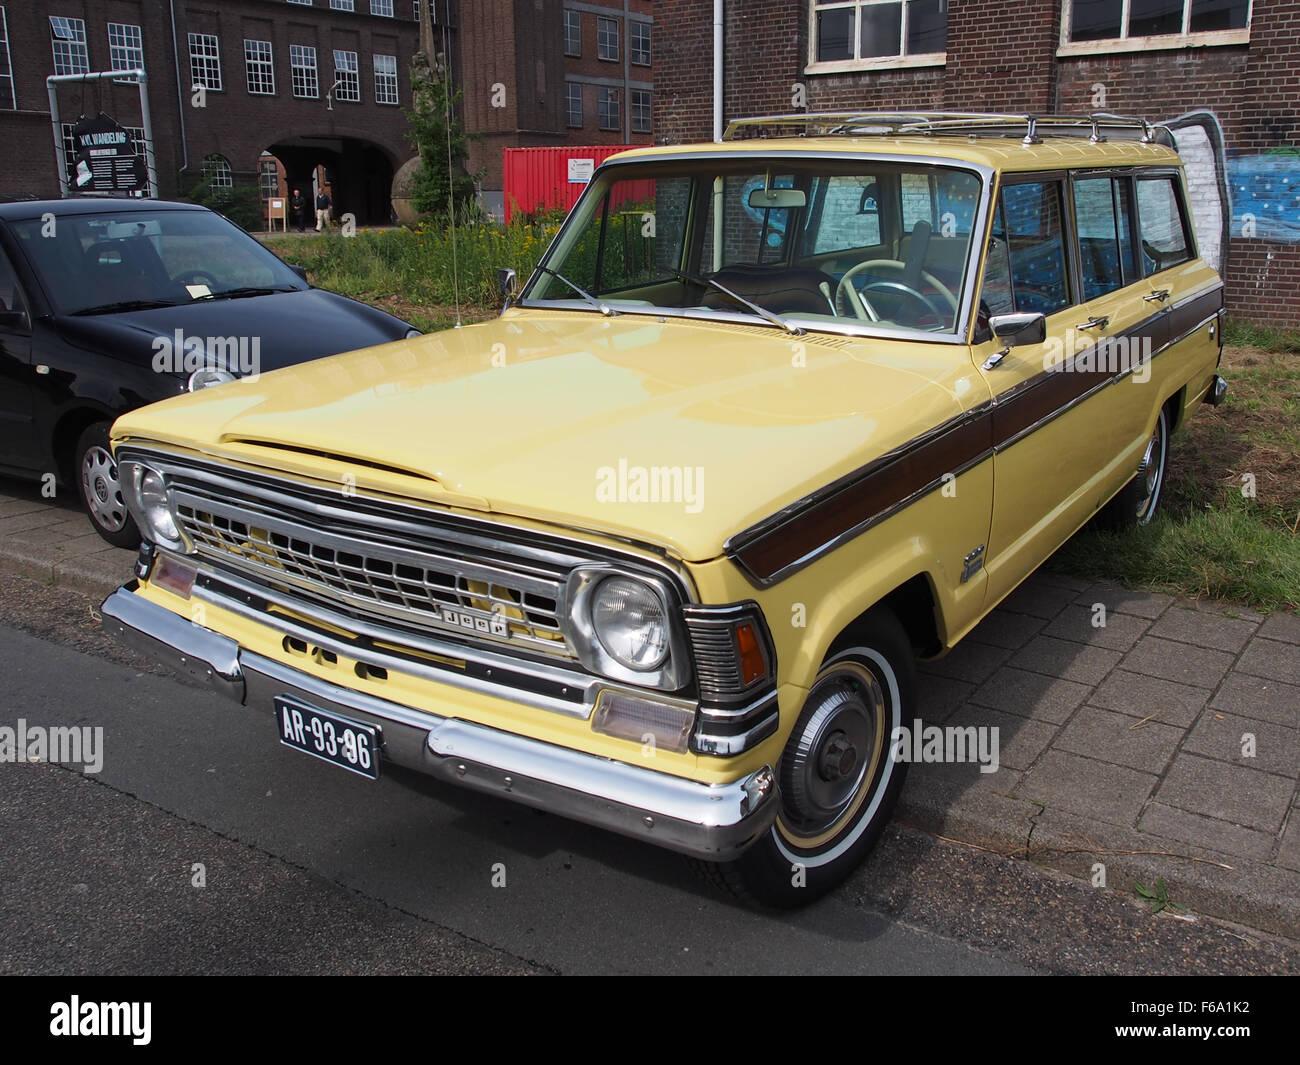 Oisterwijkste Stoomdagen 2015 1972 Jeep Wagoneer Stock Photo